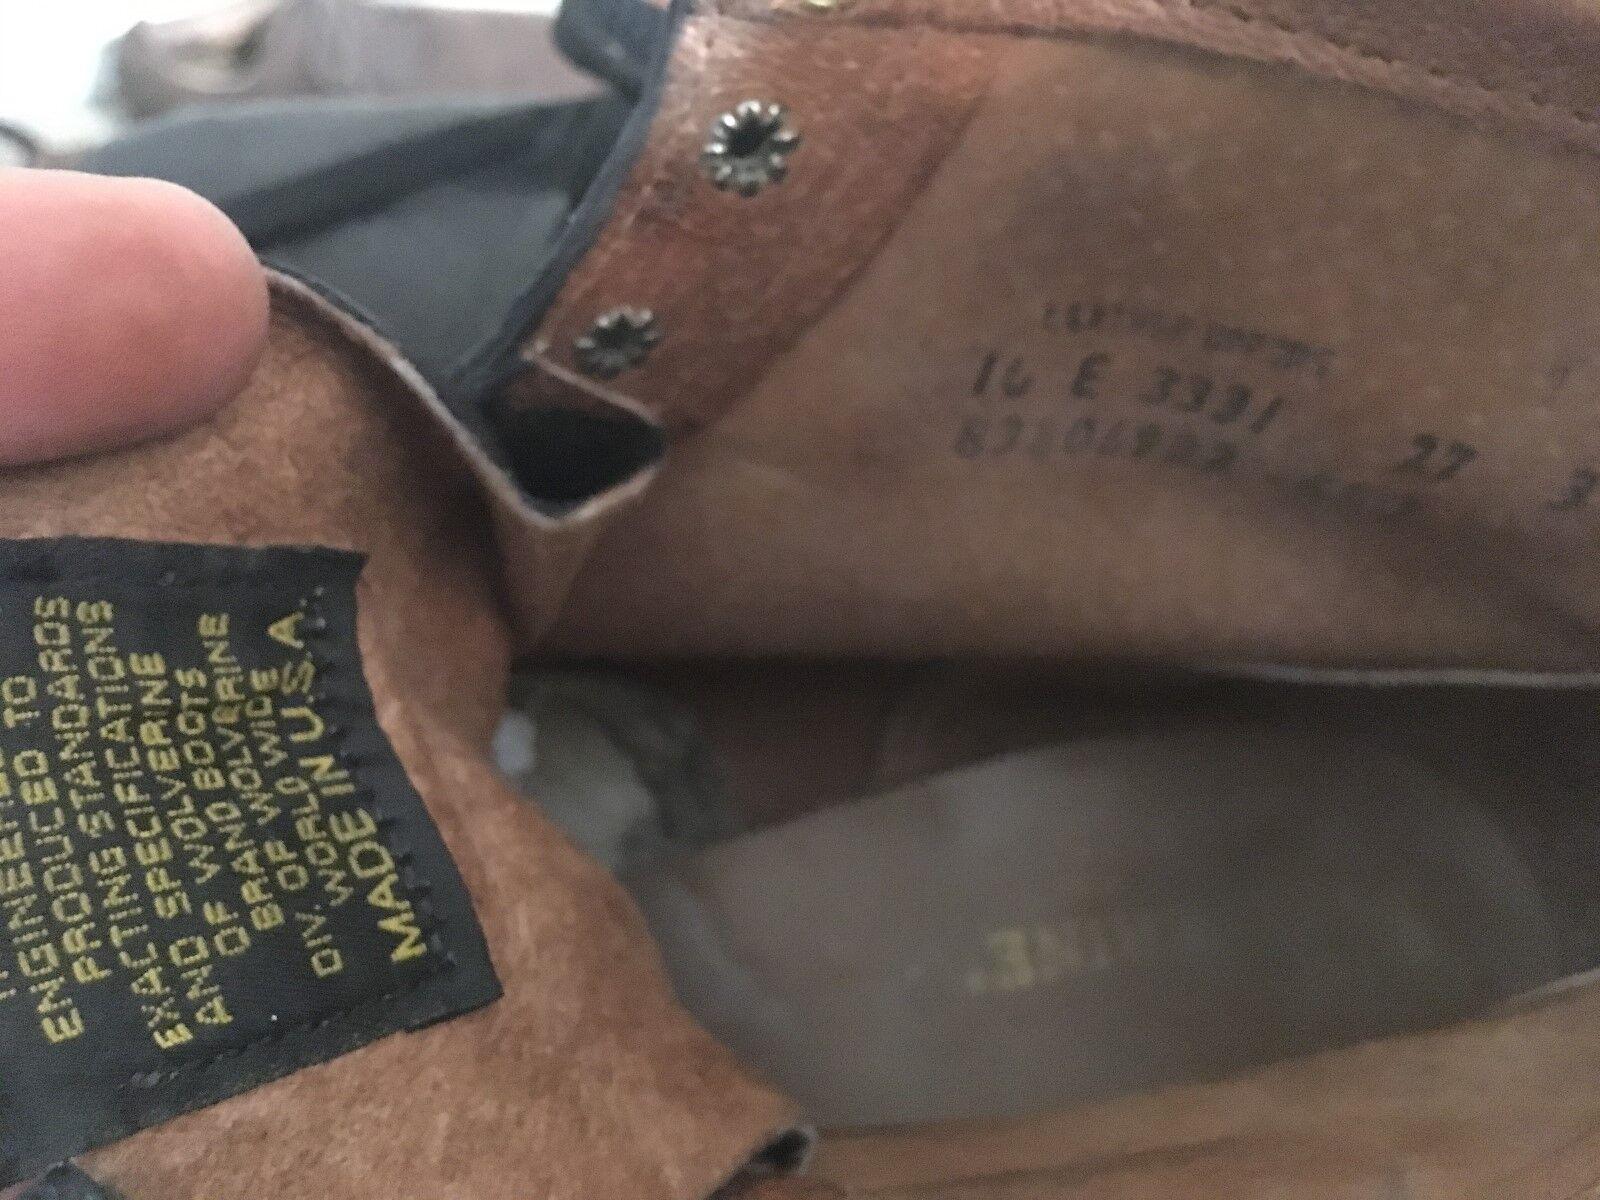 WOLVERINE BLACK USA DISTRESSED RANCH E WORK TRUCKER Stiefel 10 E RANCH 450794